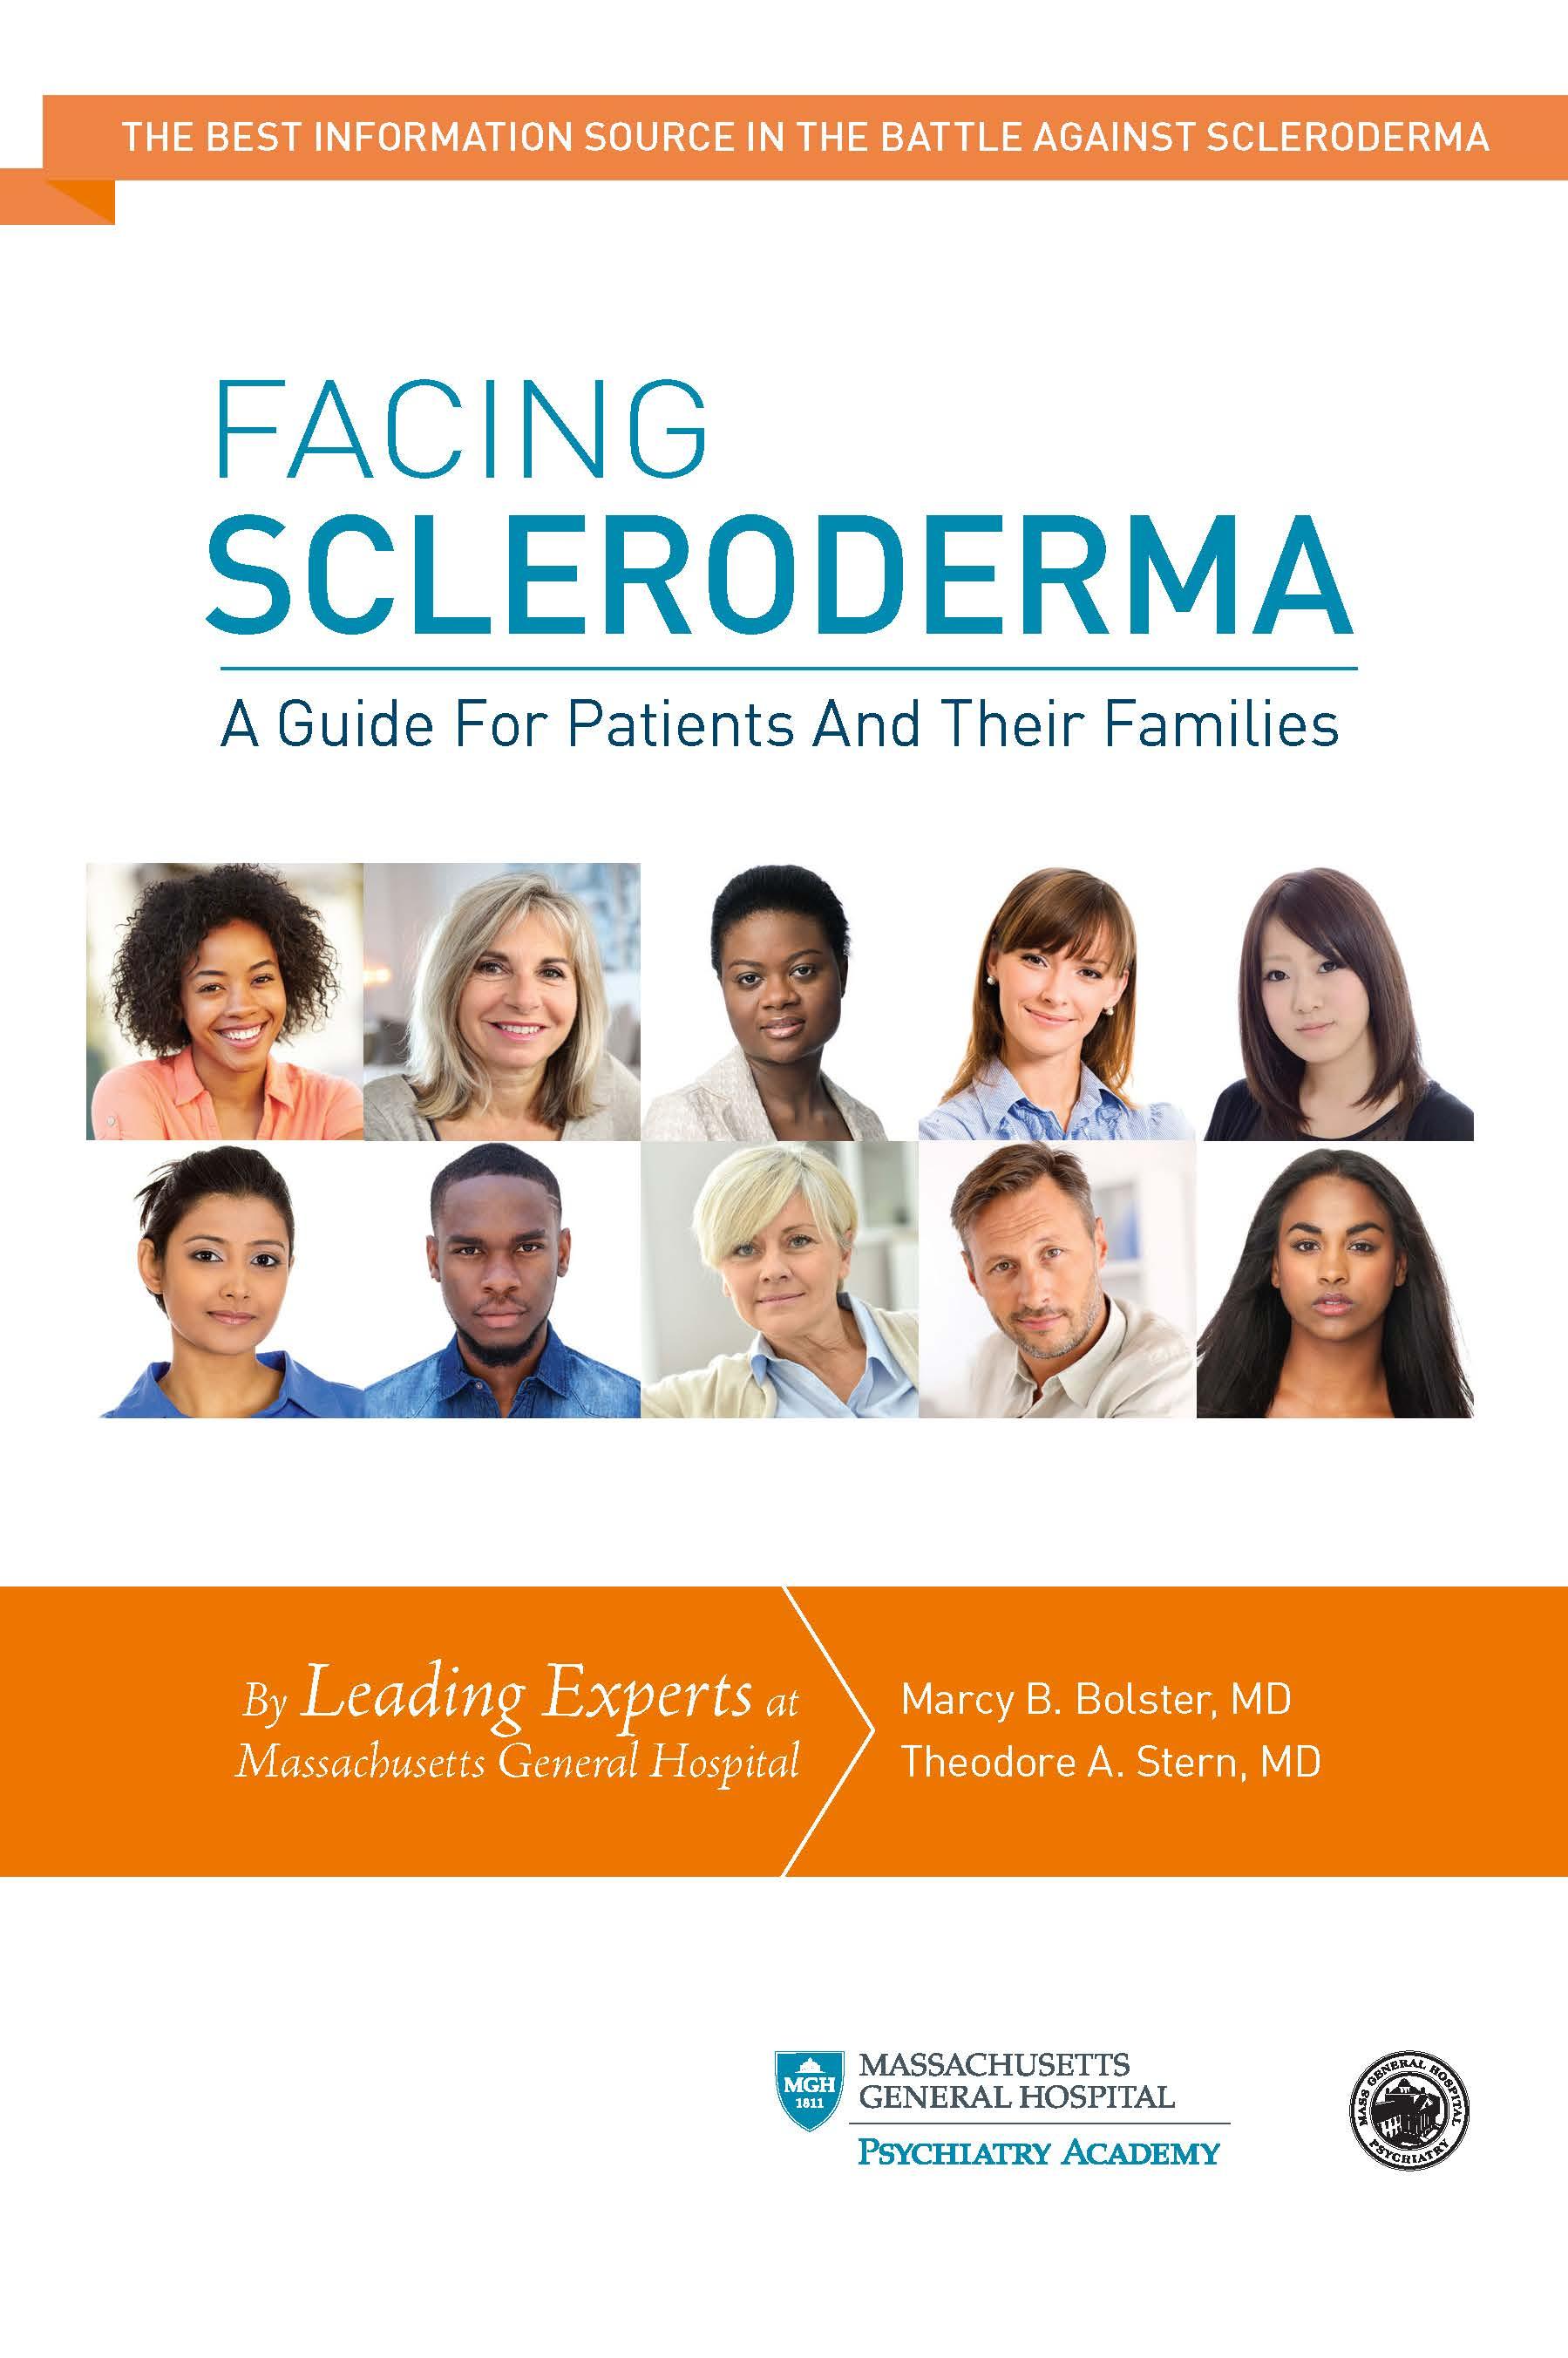 Facing Scleroderma